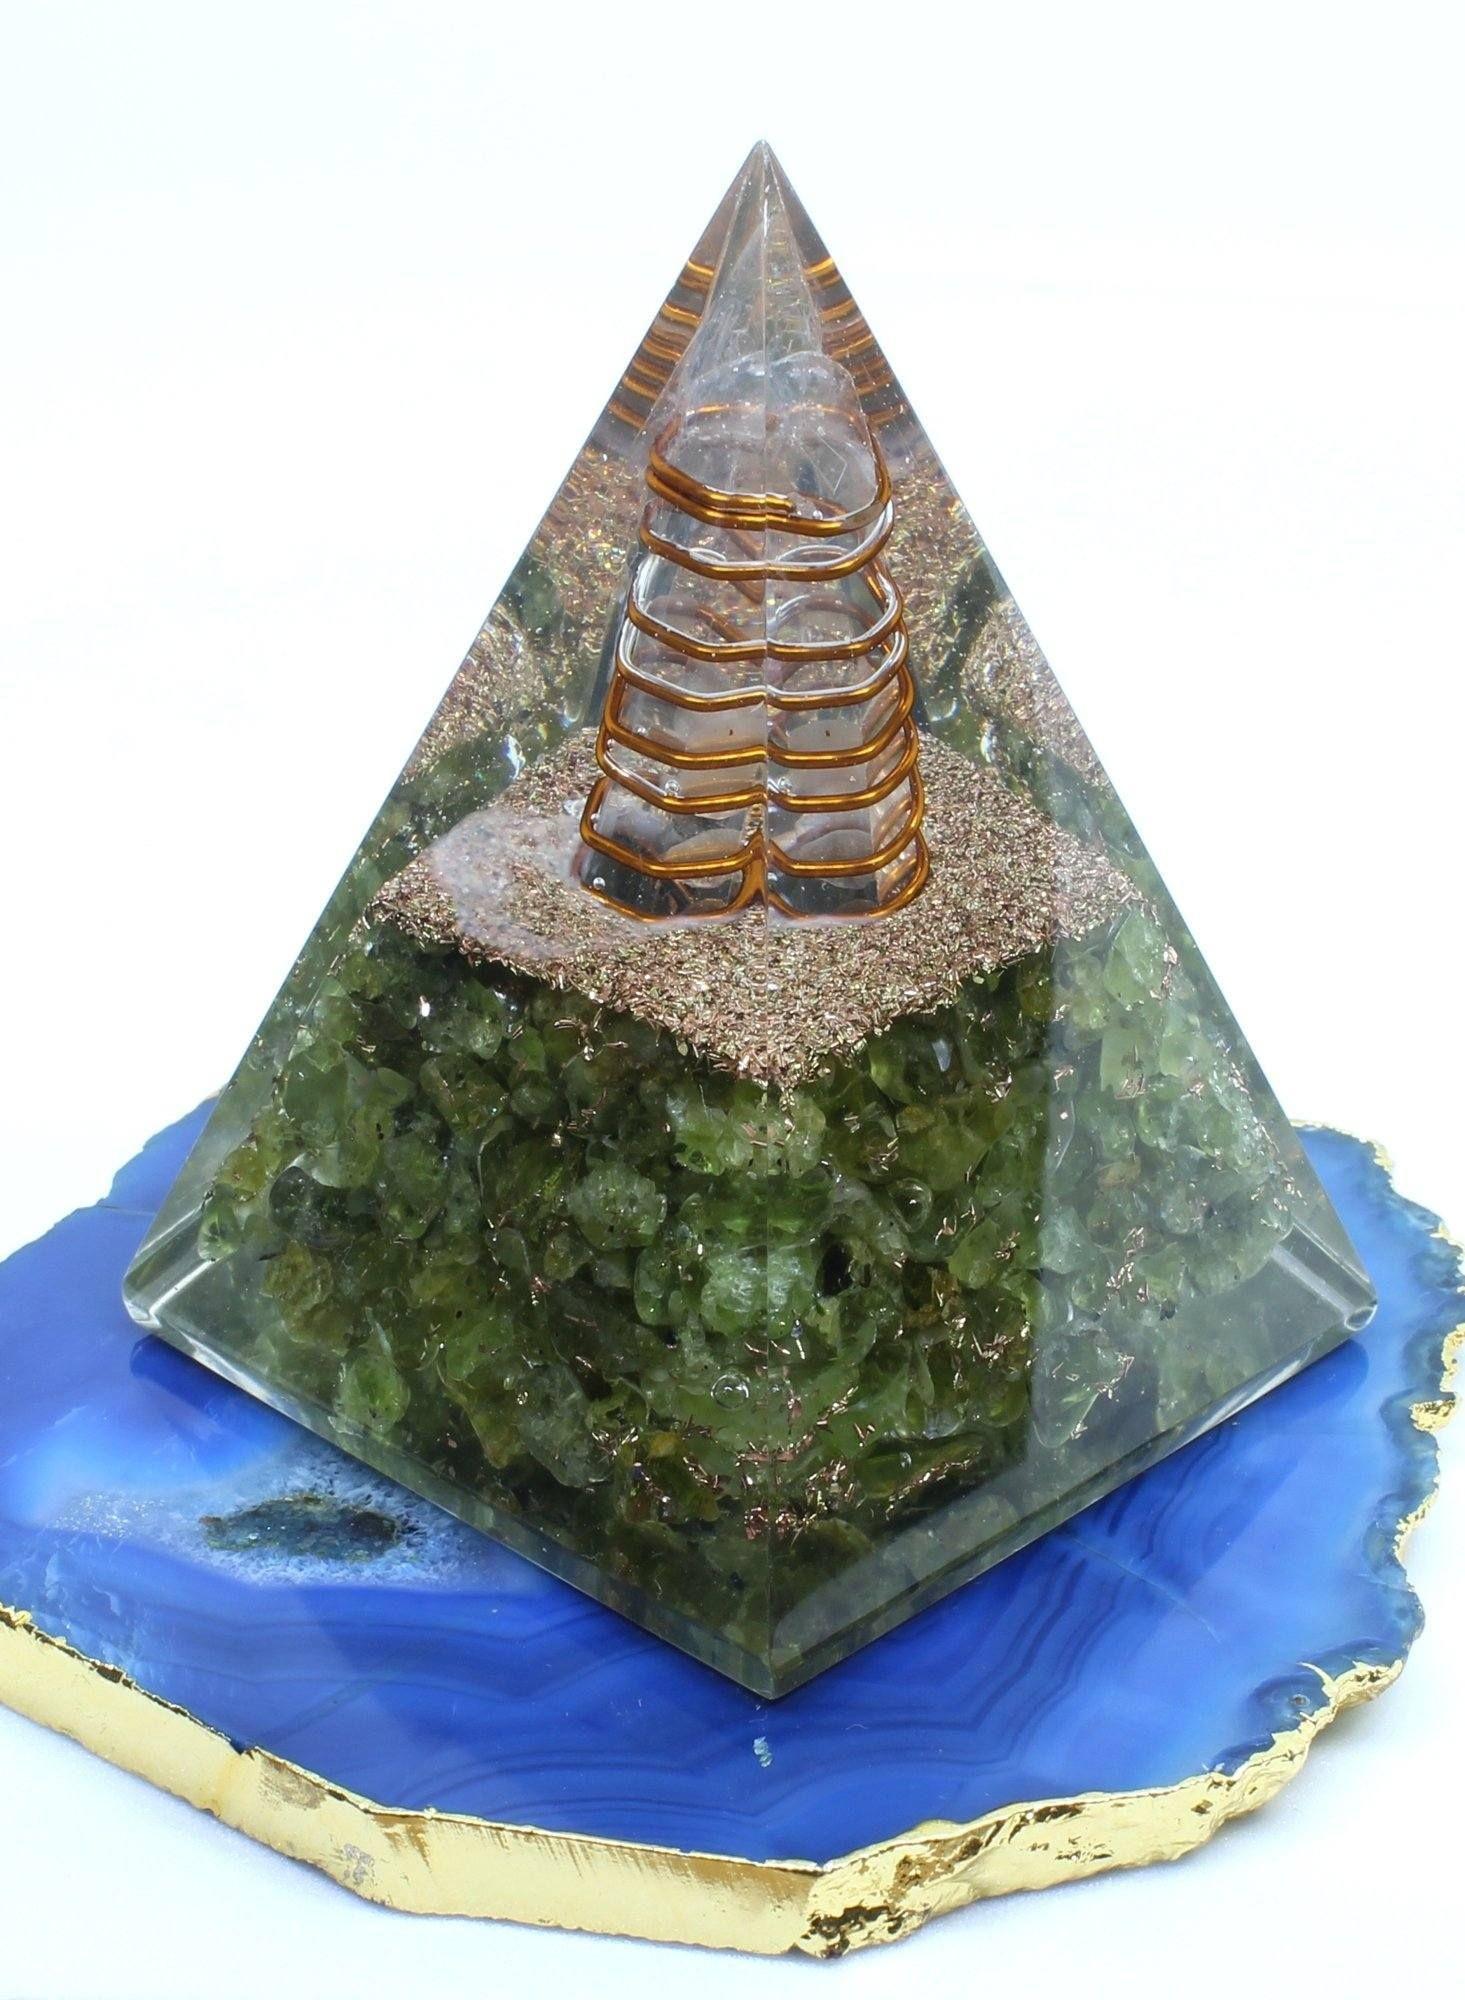 Orgone Nubian Peridot Energy Pyramid Orgonite Crystal Energy Pyramid Orgonite Orgone Energy